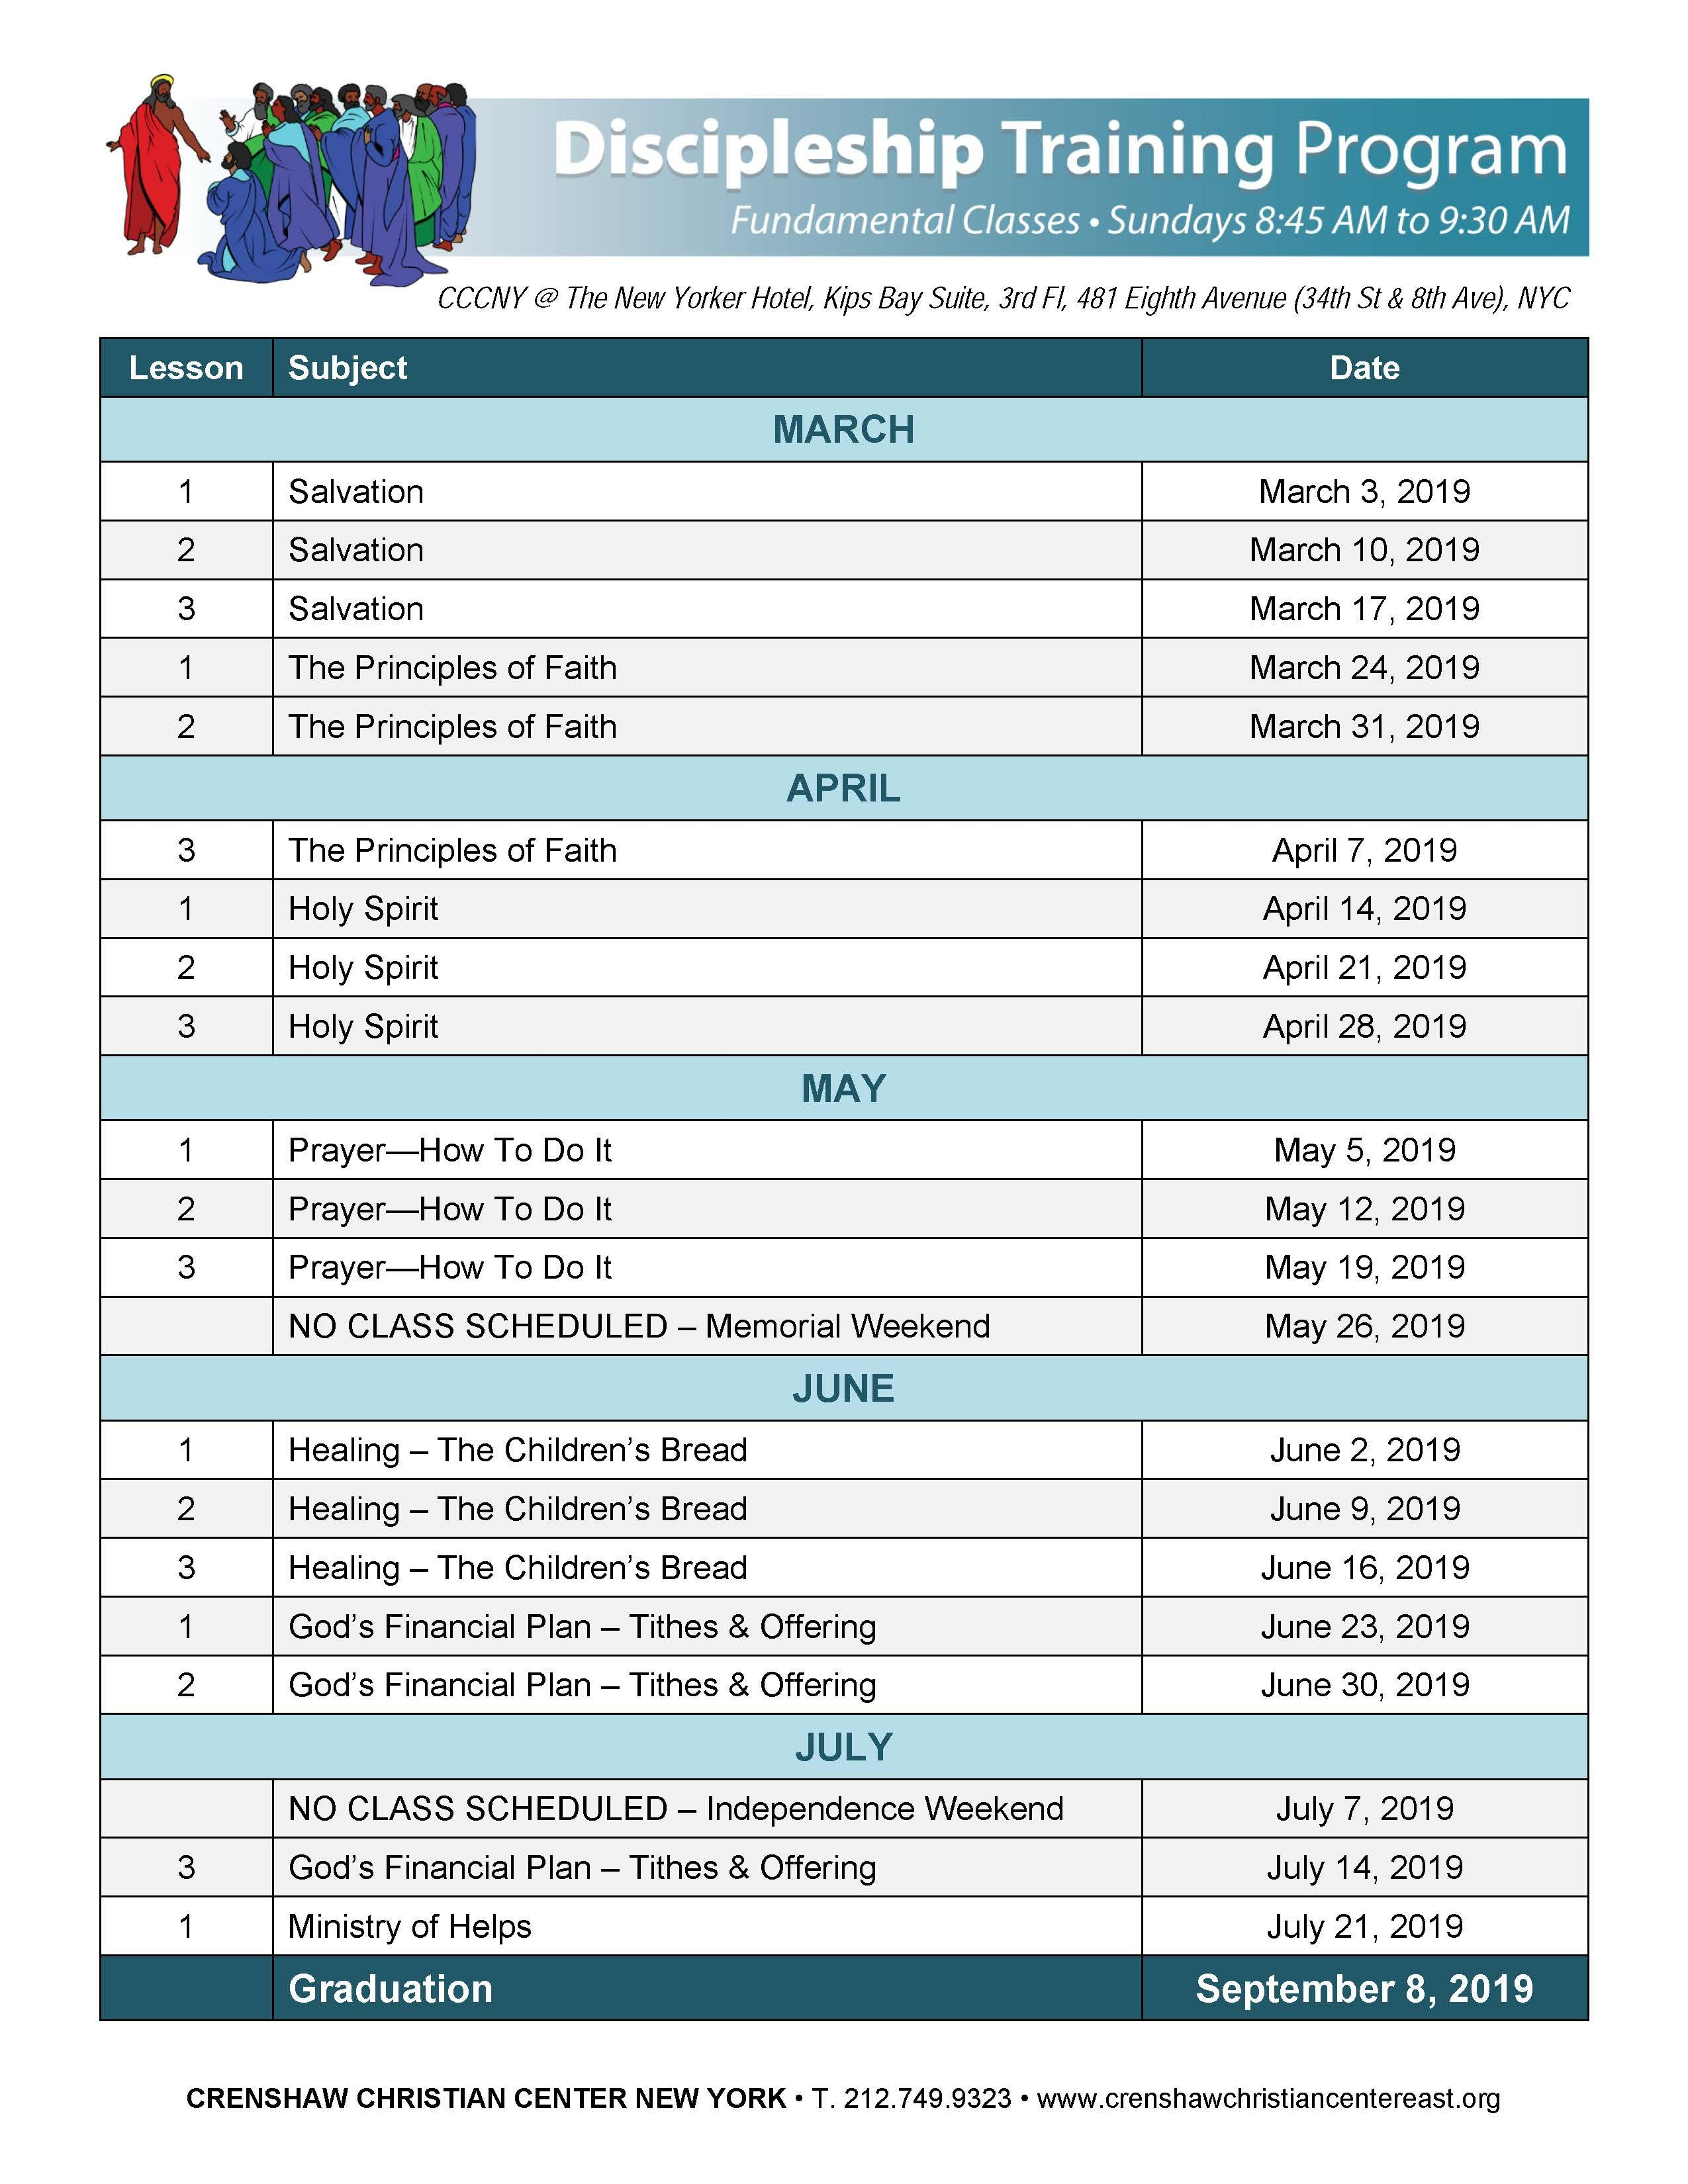 Ccc Calendar 2019 CCC New York 2019 Discipleship Training Program   CCC New York